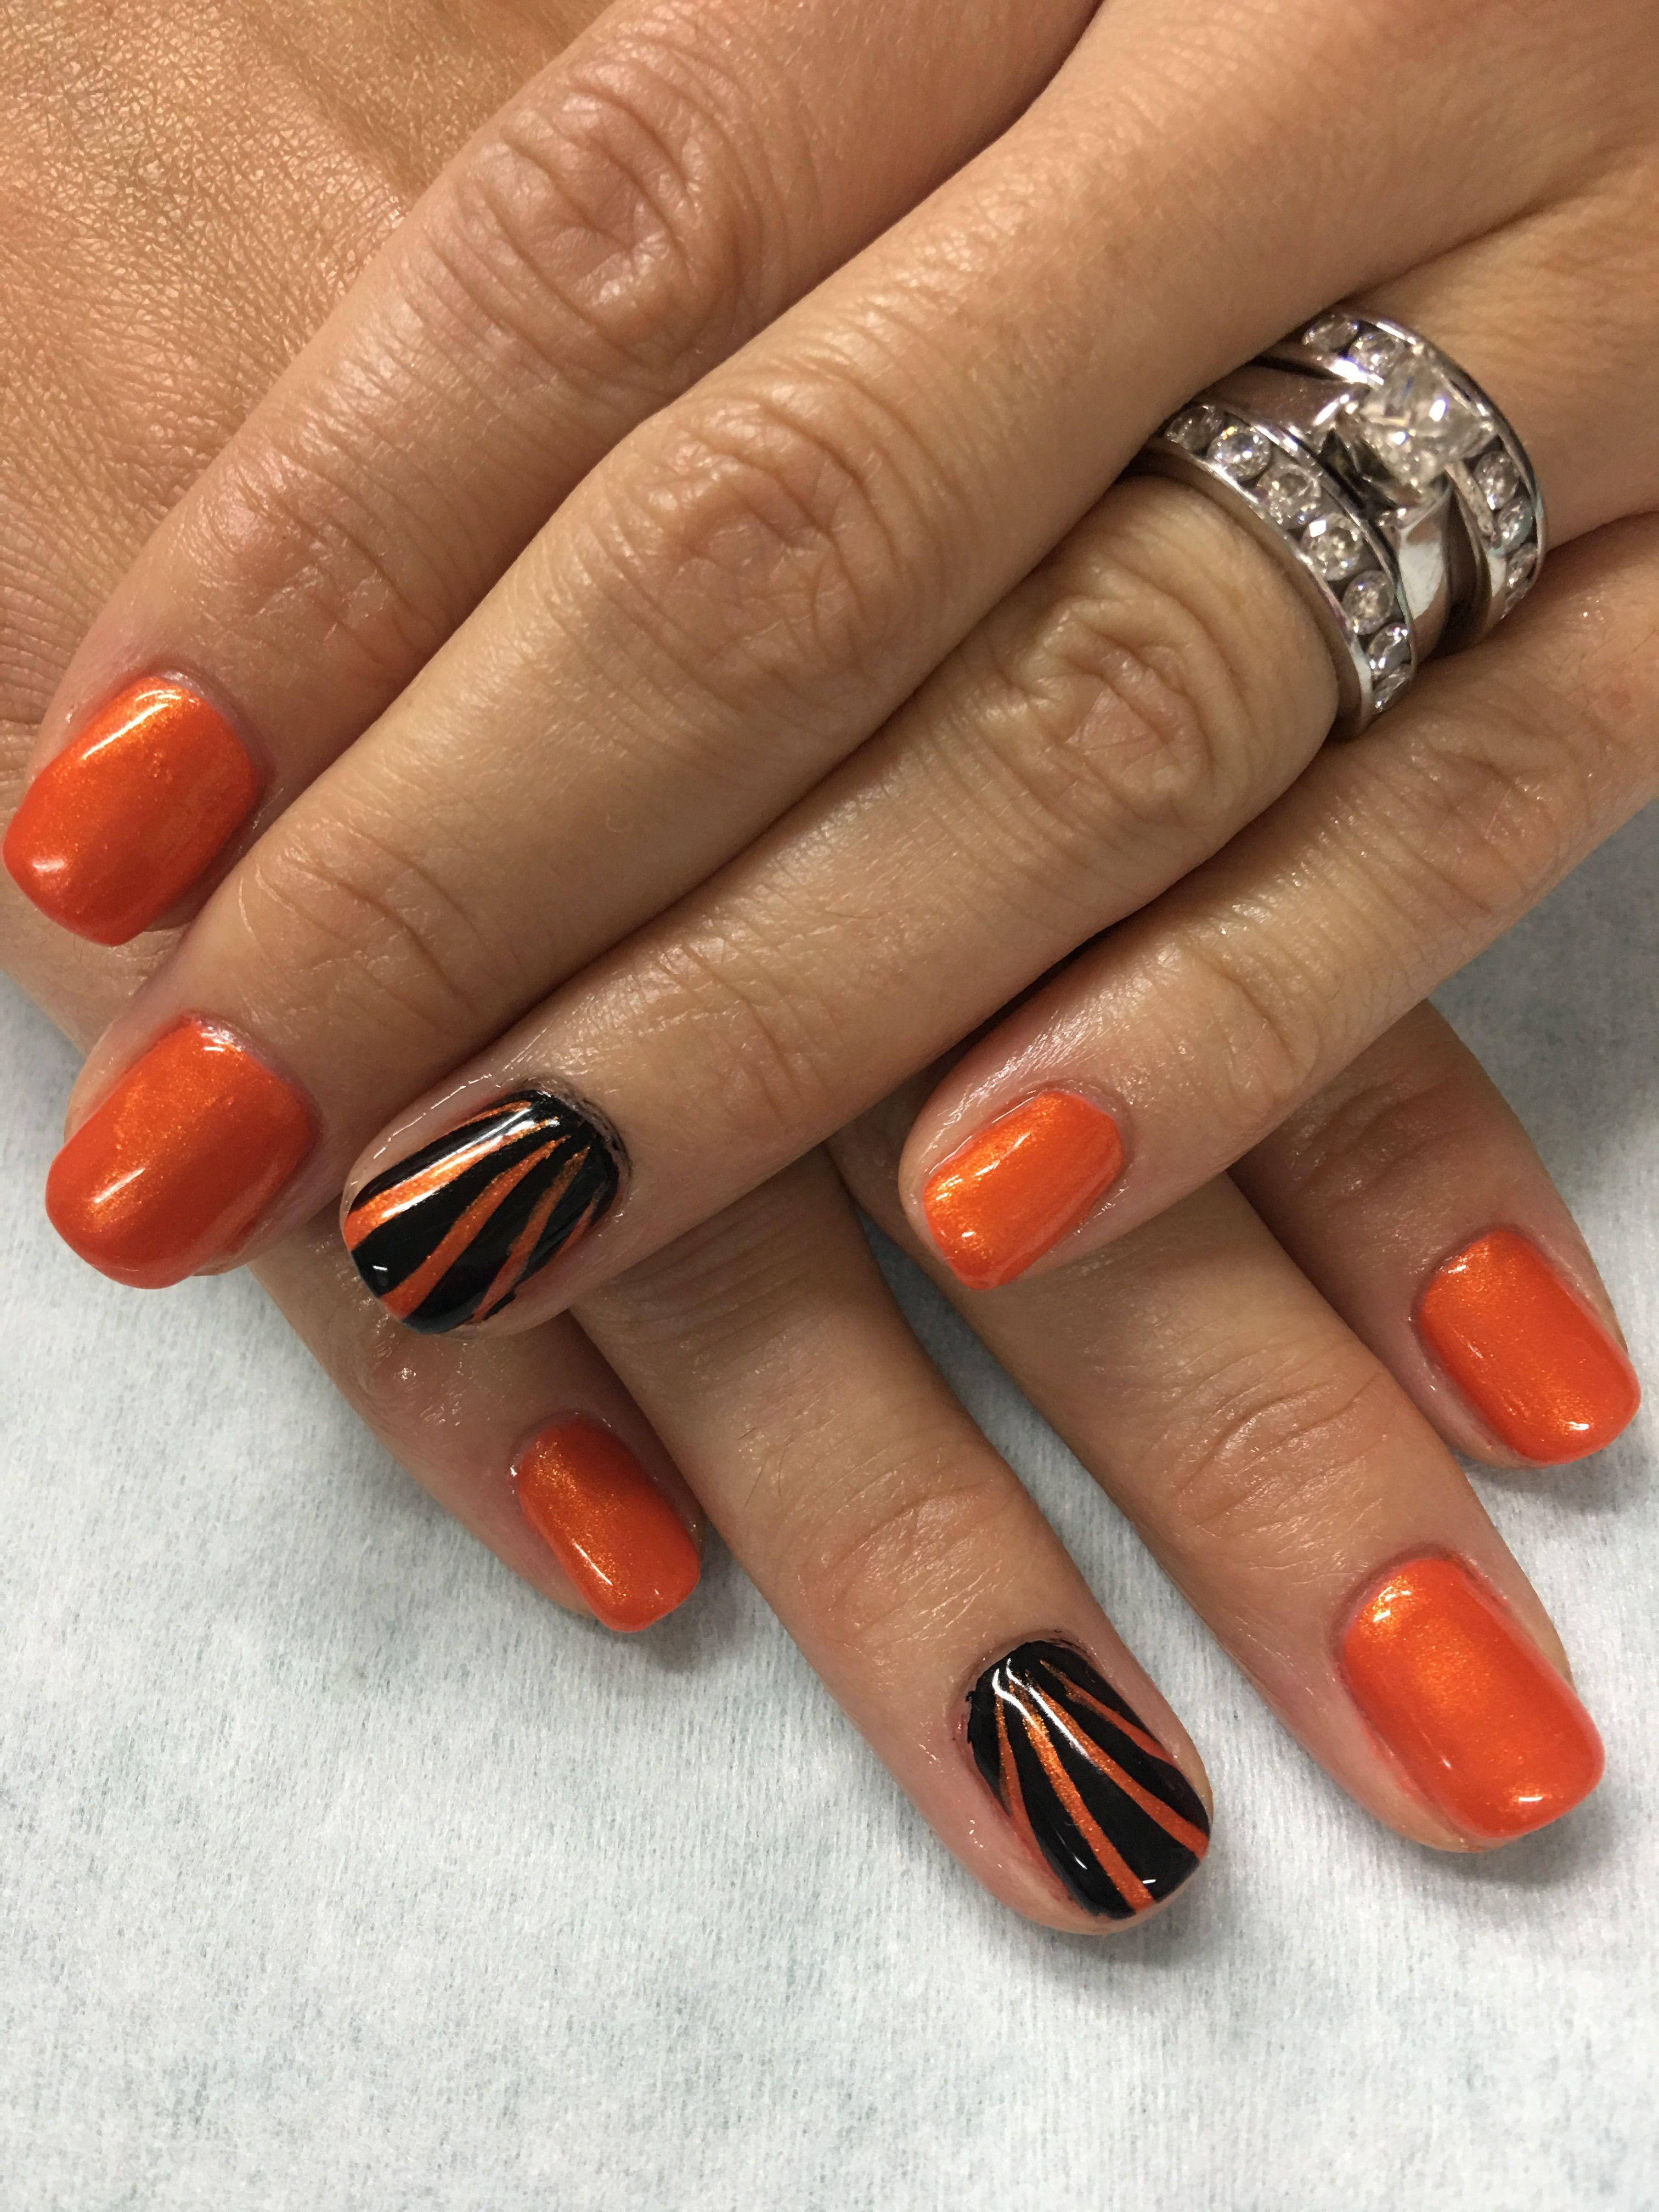 Orange And Black Stripe Fall Halloween Gel Nails Gel Nails Glitter Gel Nails Striped Nail Designs